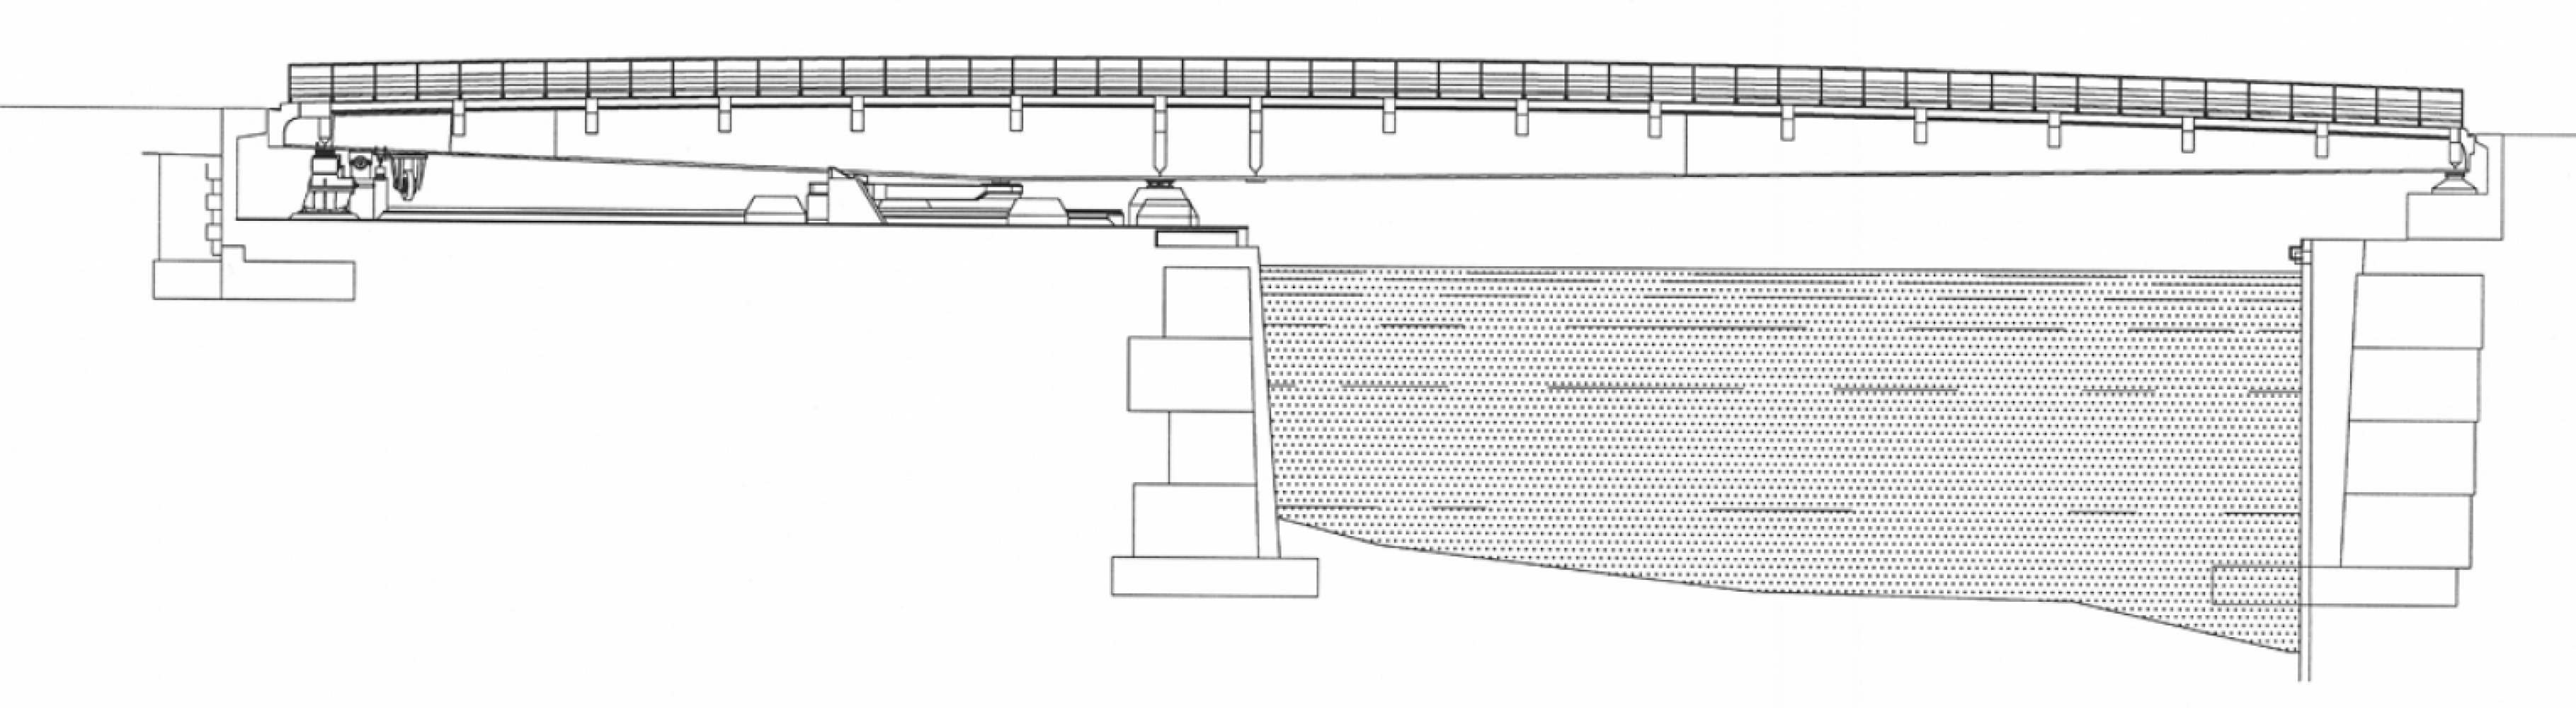 sete02 Pascale SEURIN Architecte - Pascale SEURIN Architecte